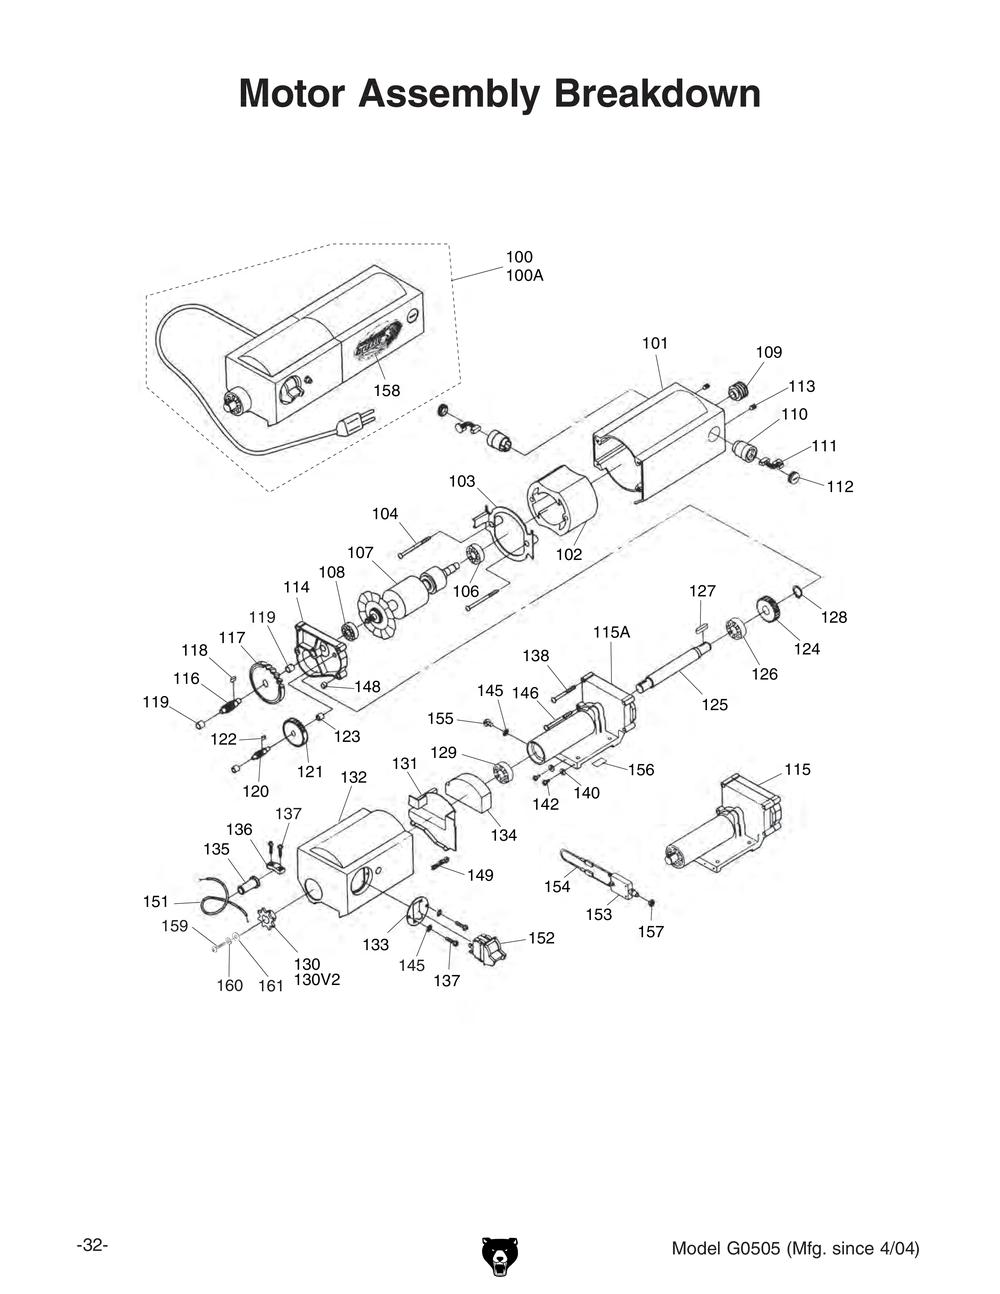 Liebert crv wiring diagram wiki share on trailer wiring diagram snatch block diagrams for 1951 reo